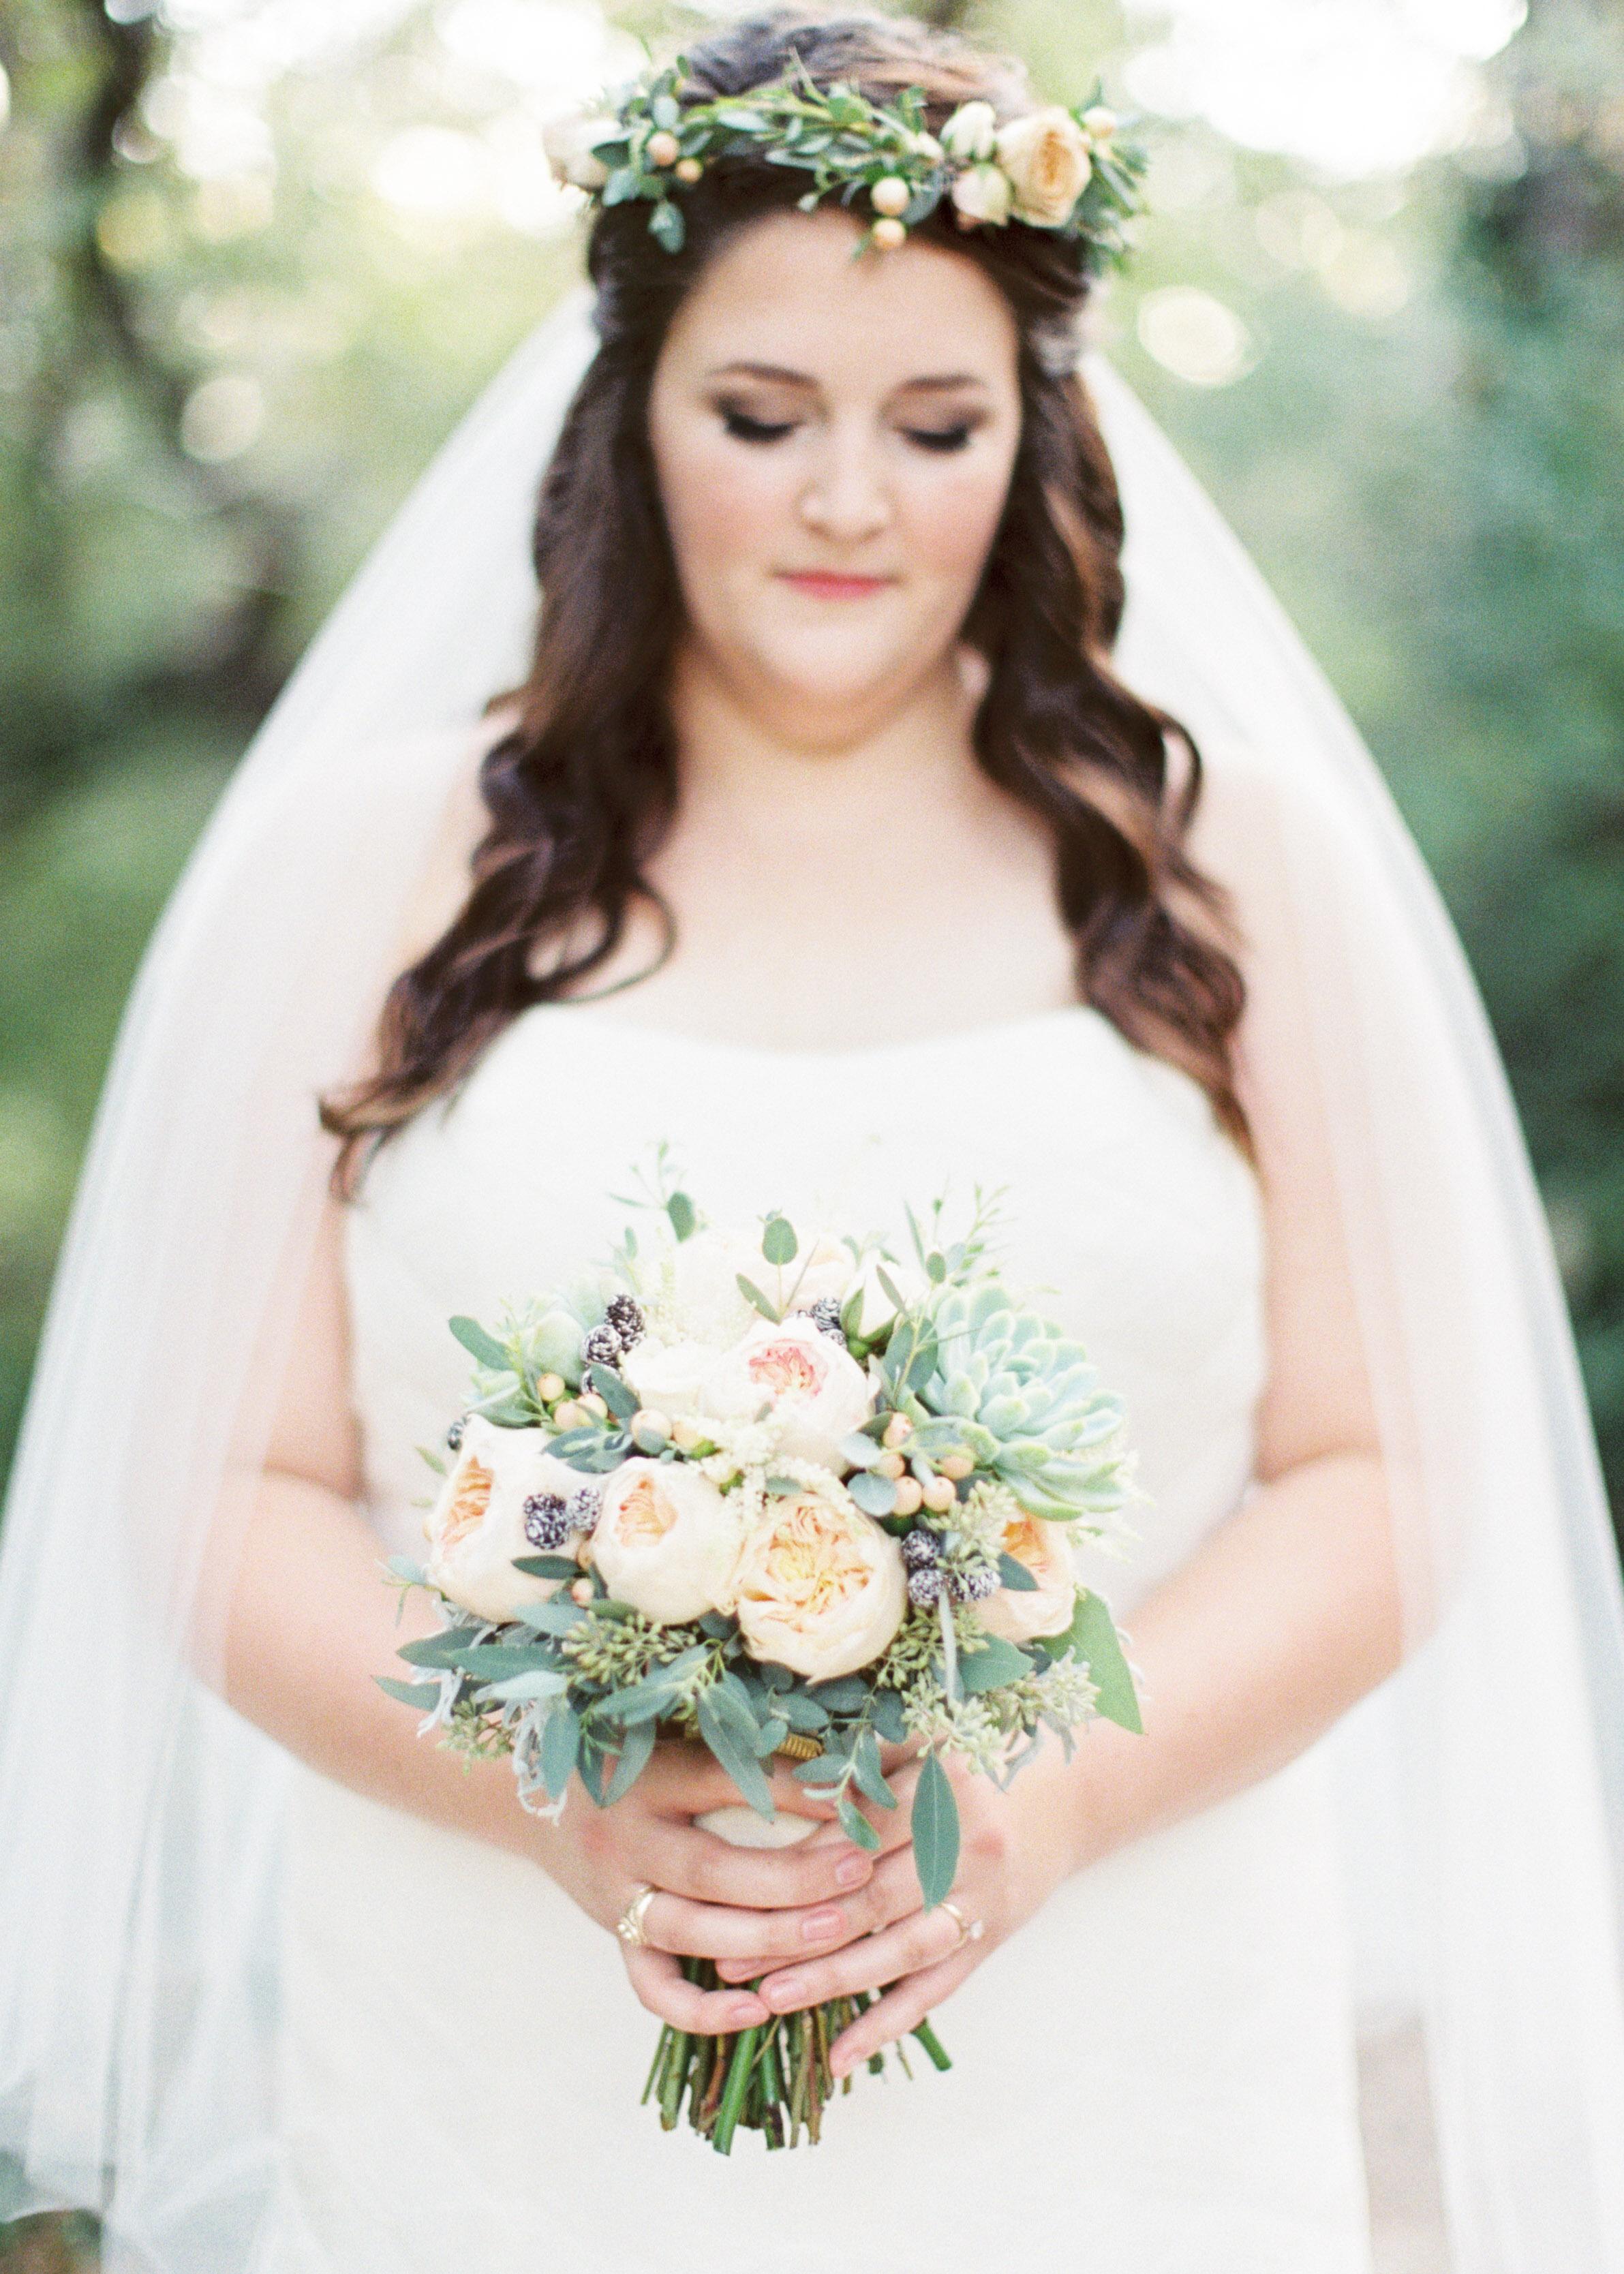 Sarah Best Photography - Elizabeth's Bridals - 7F Lodge-125.jpg